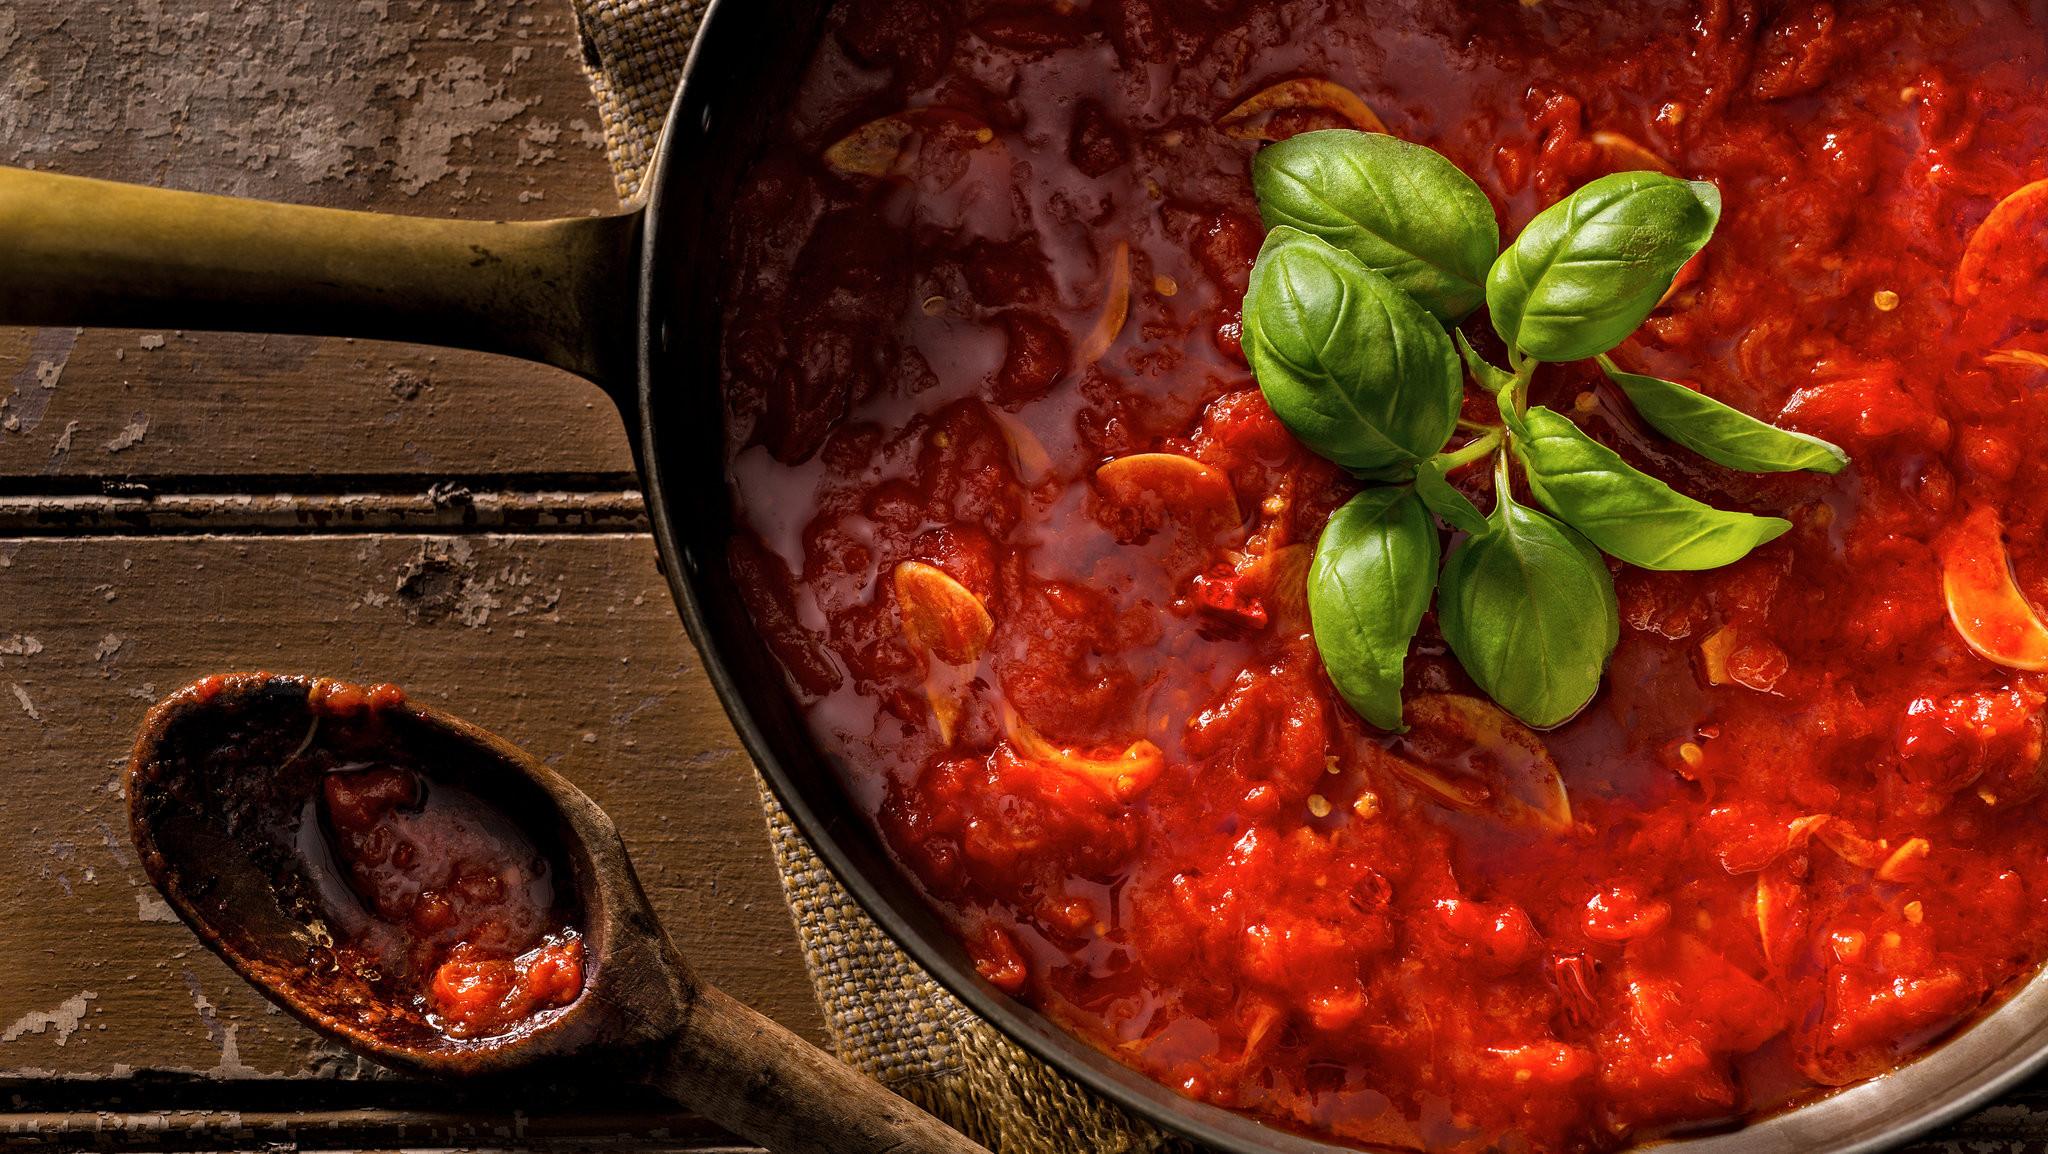 Homemade Spaghetti Sauce From Fresh Tomatoes Real Italian  Classic Marinara Sauce Recipe NYT Cooking